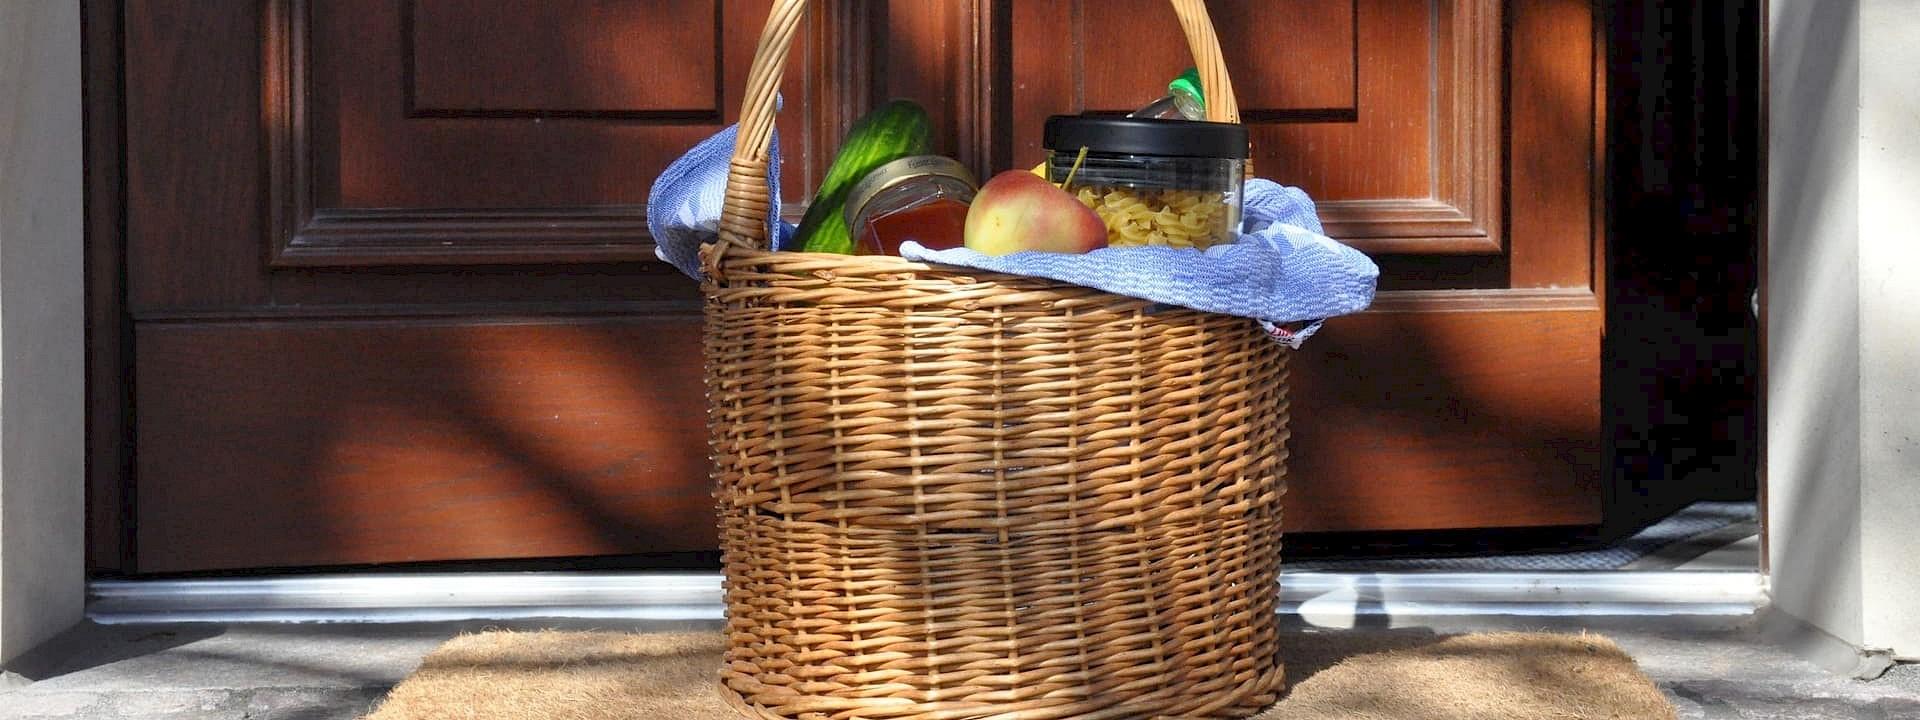 Lokalen Handel unterstützen Münsterland liefert